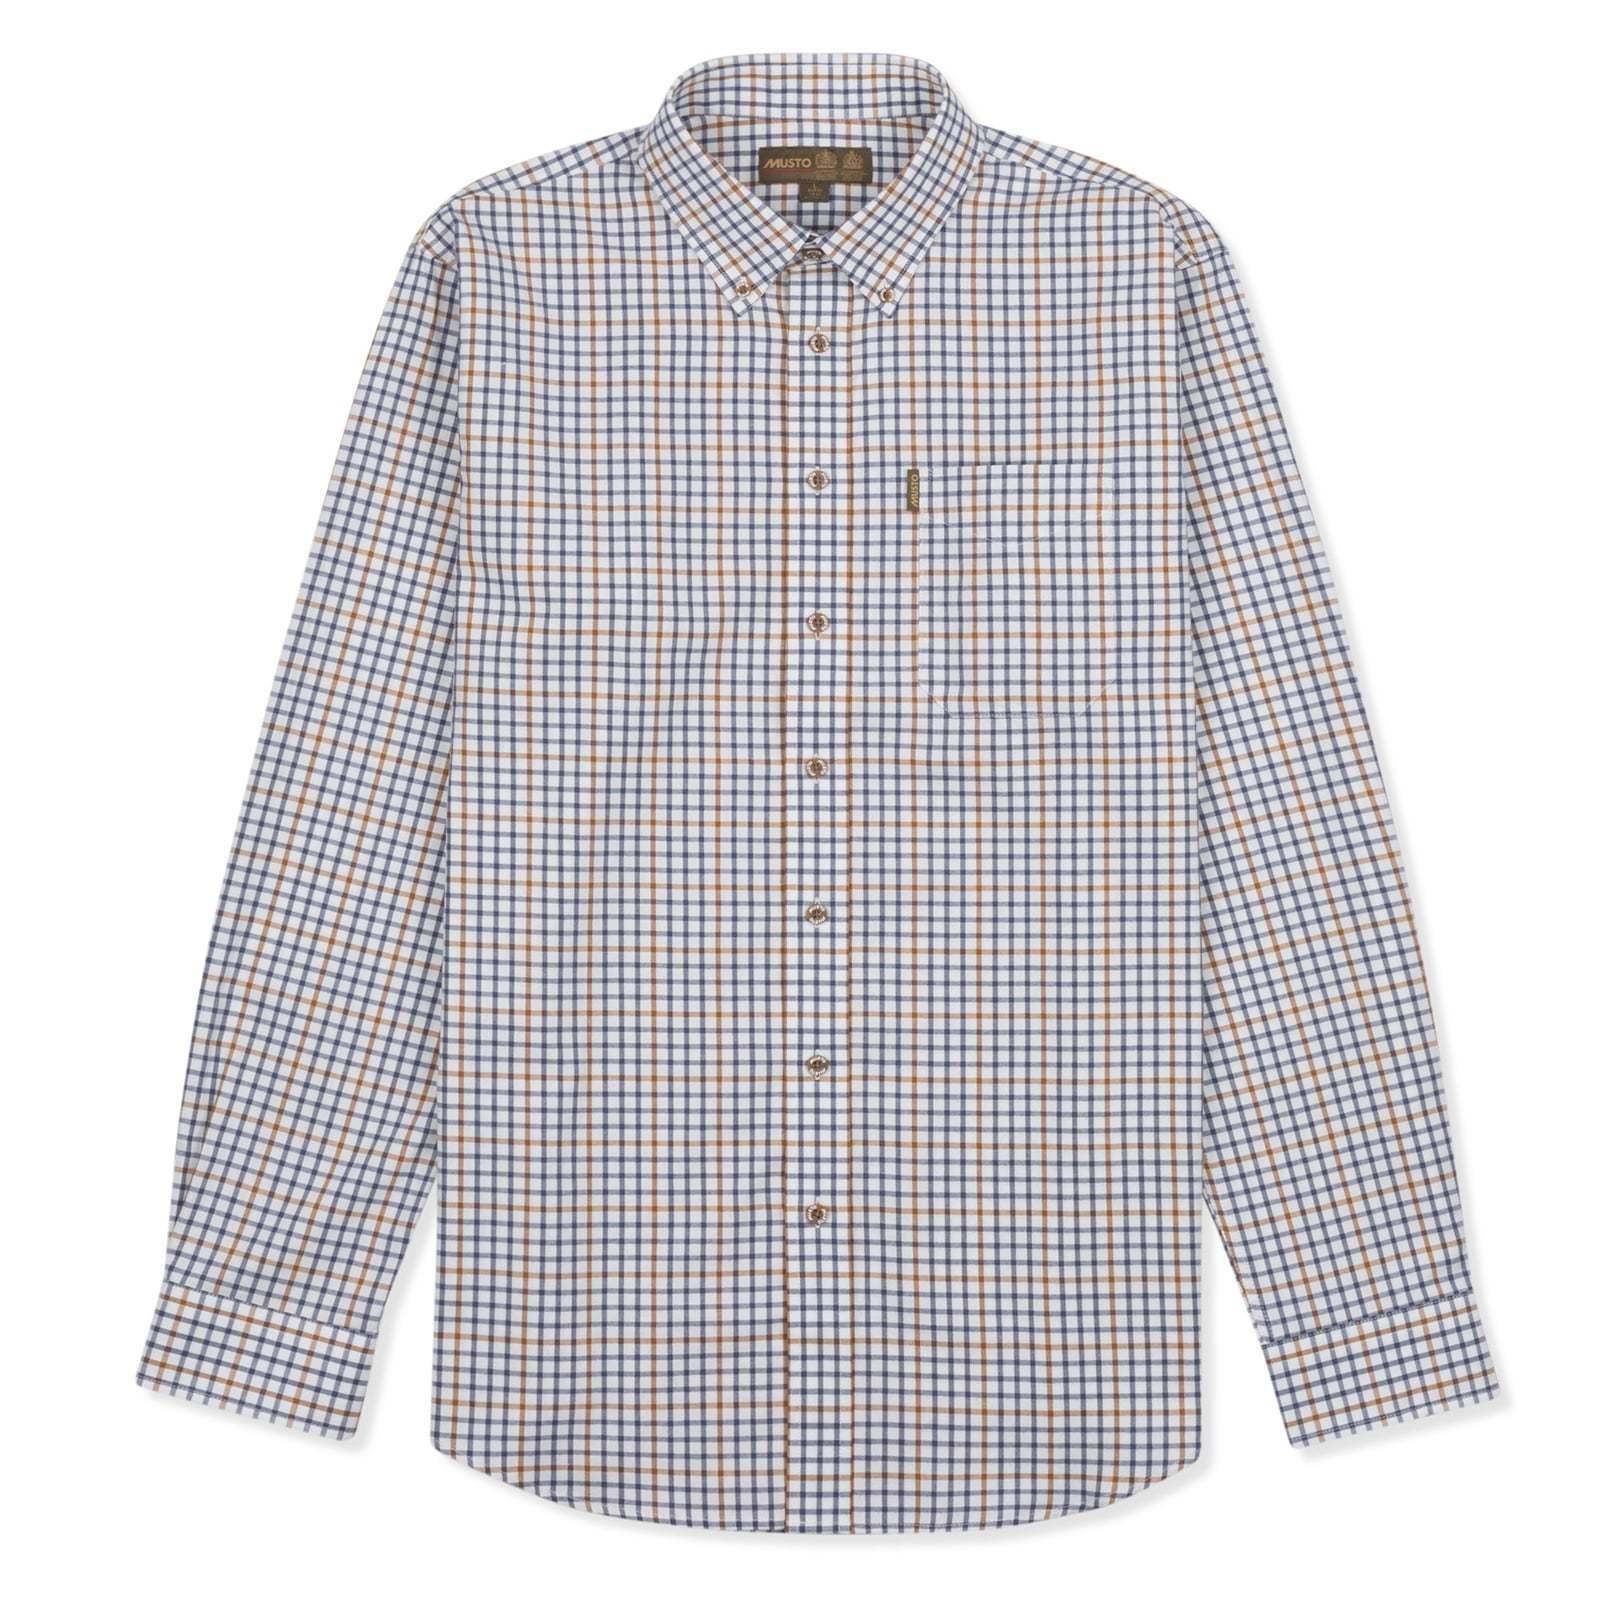 Musto Classic Button Down Shirt - Keldy bluee